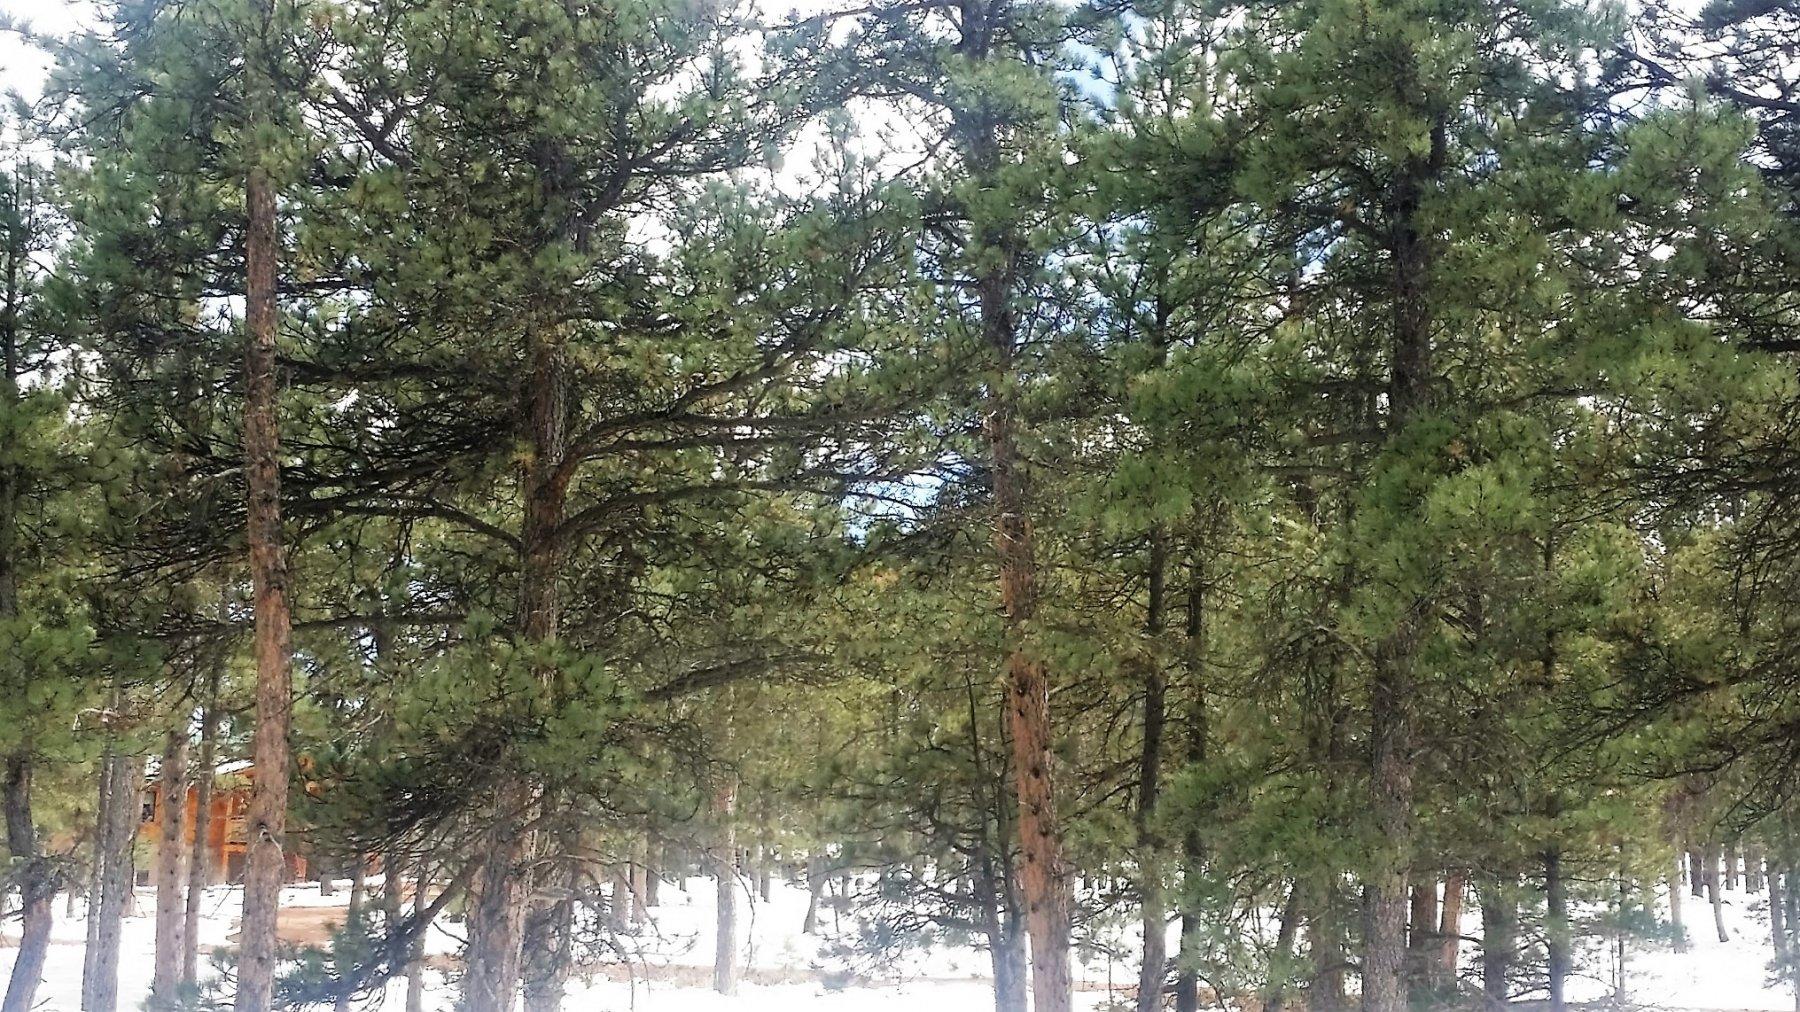 25-631-Trees4.jpg